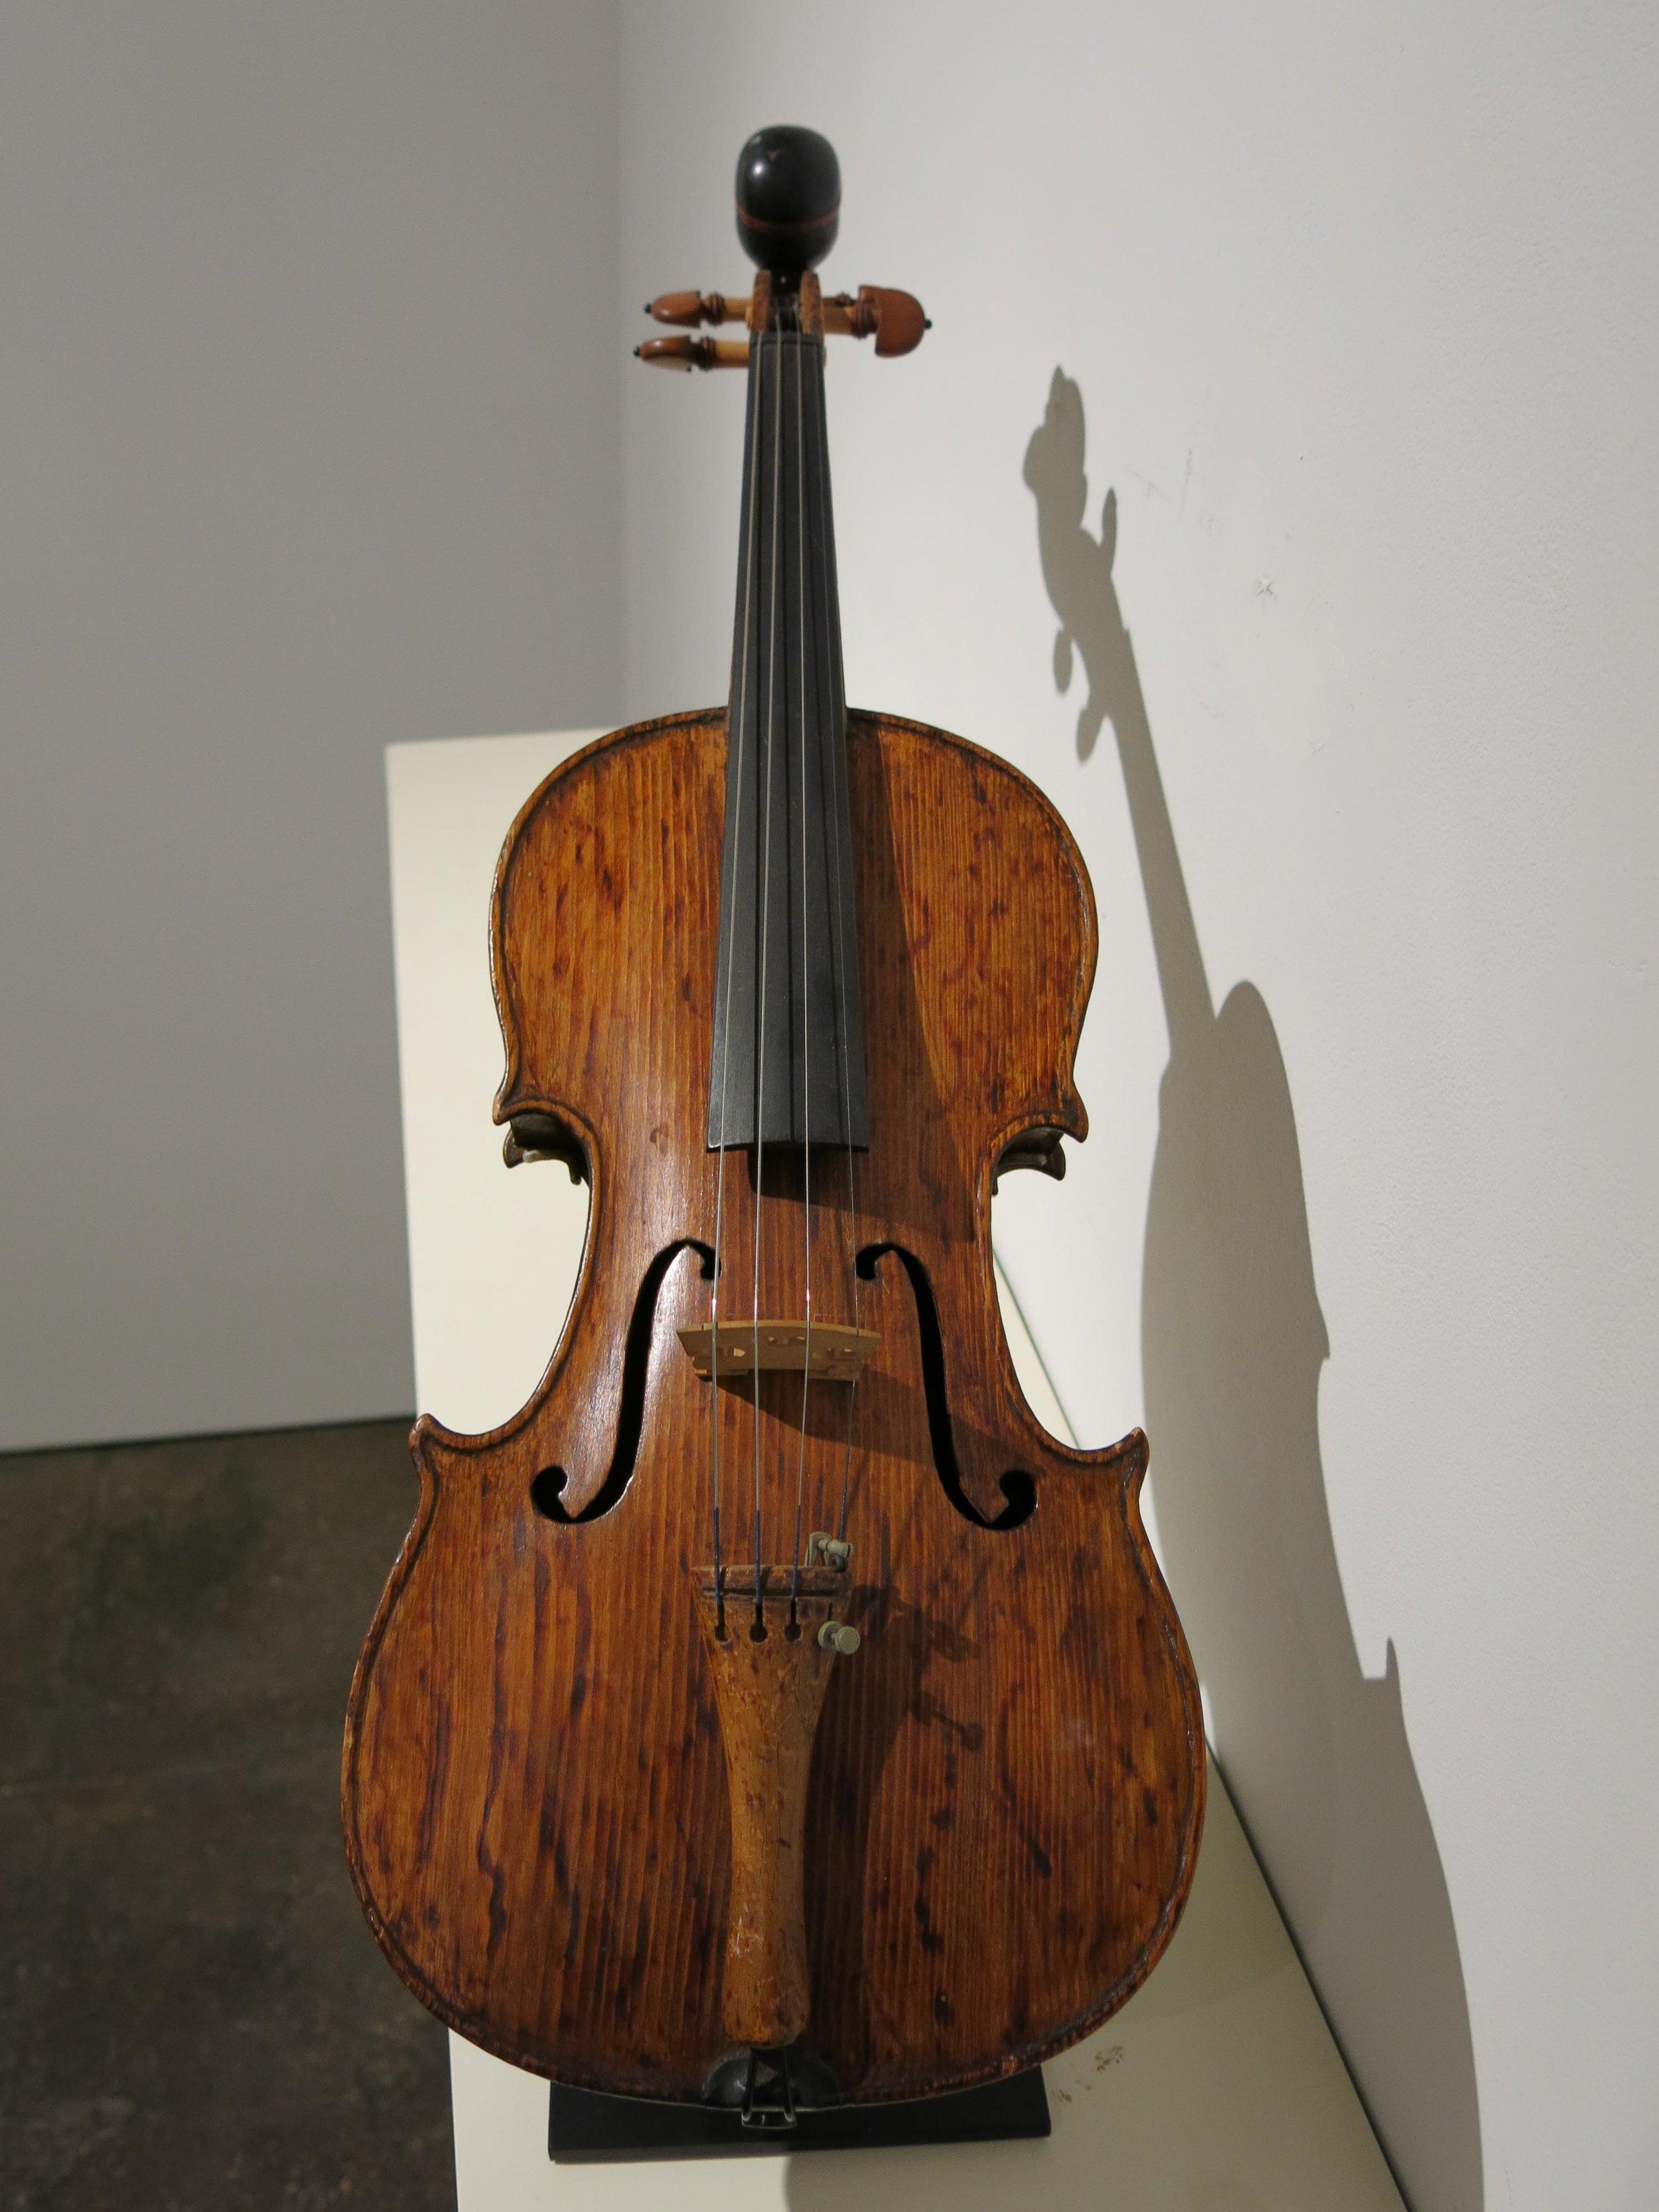 Edmond Martin, Violin, early 20th c., wood, strings, 24h x 8w x 3d in.